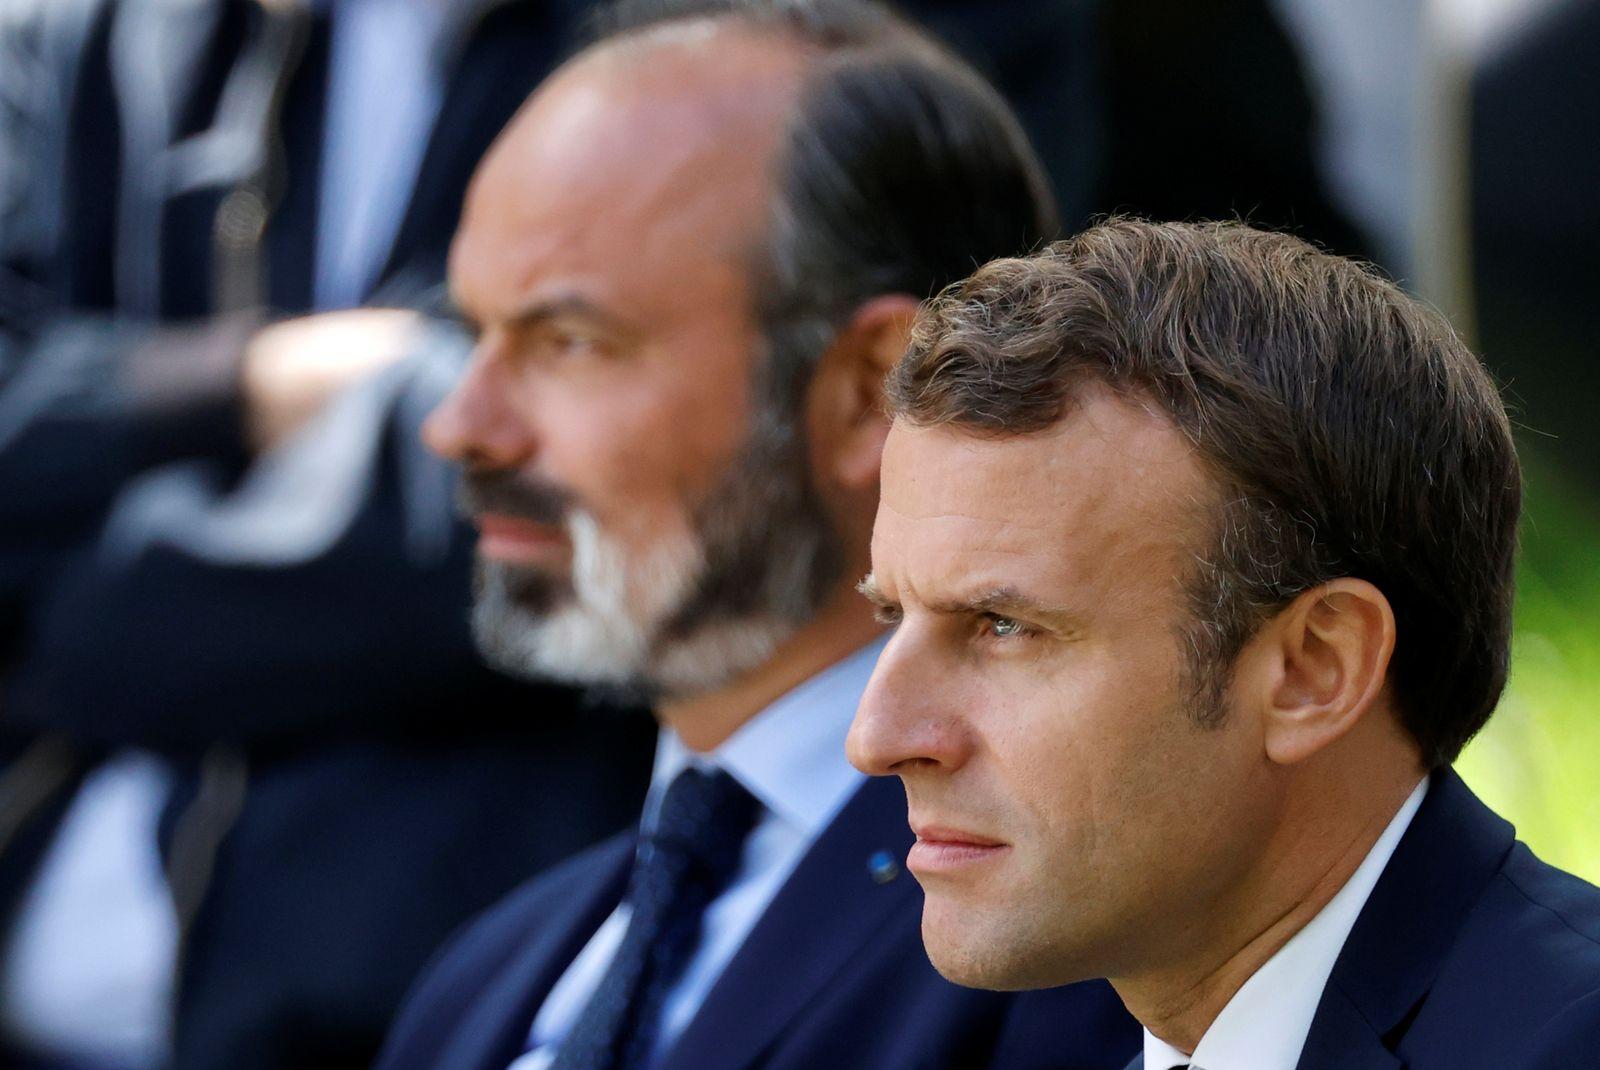 FILES-FRANCE-POLITICS-RESIGNATION-GOVERNMENT